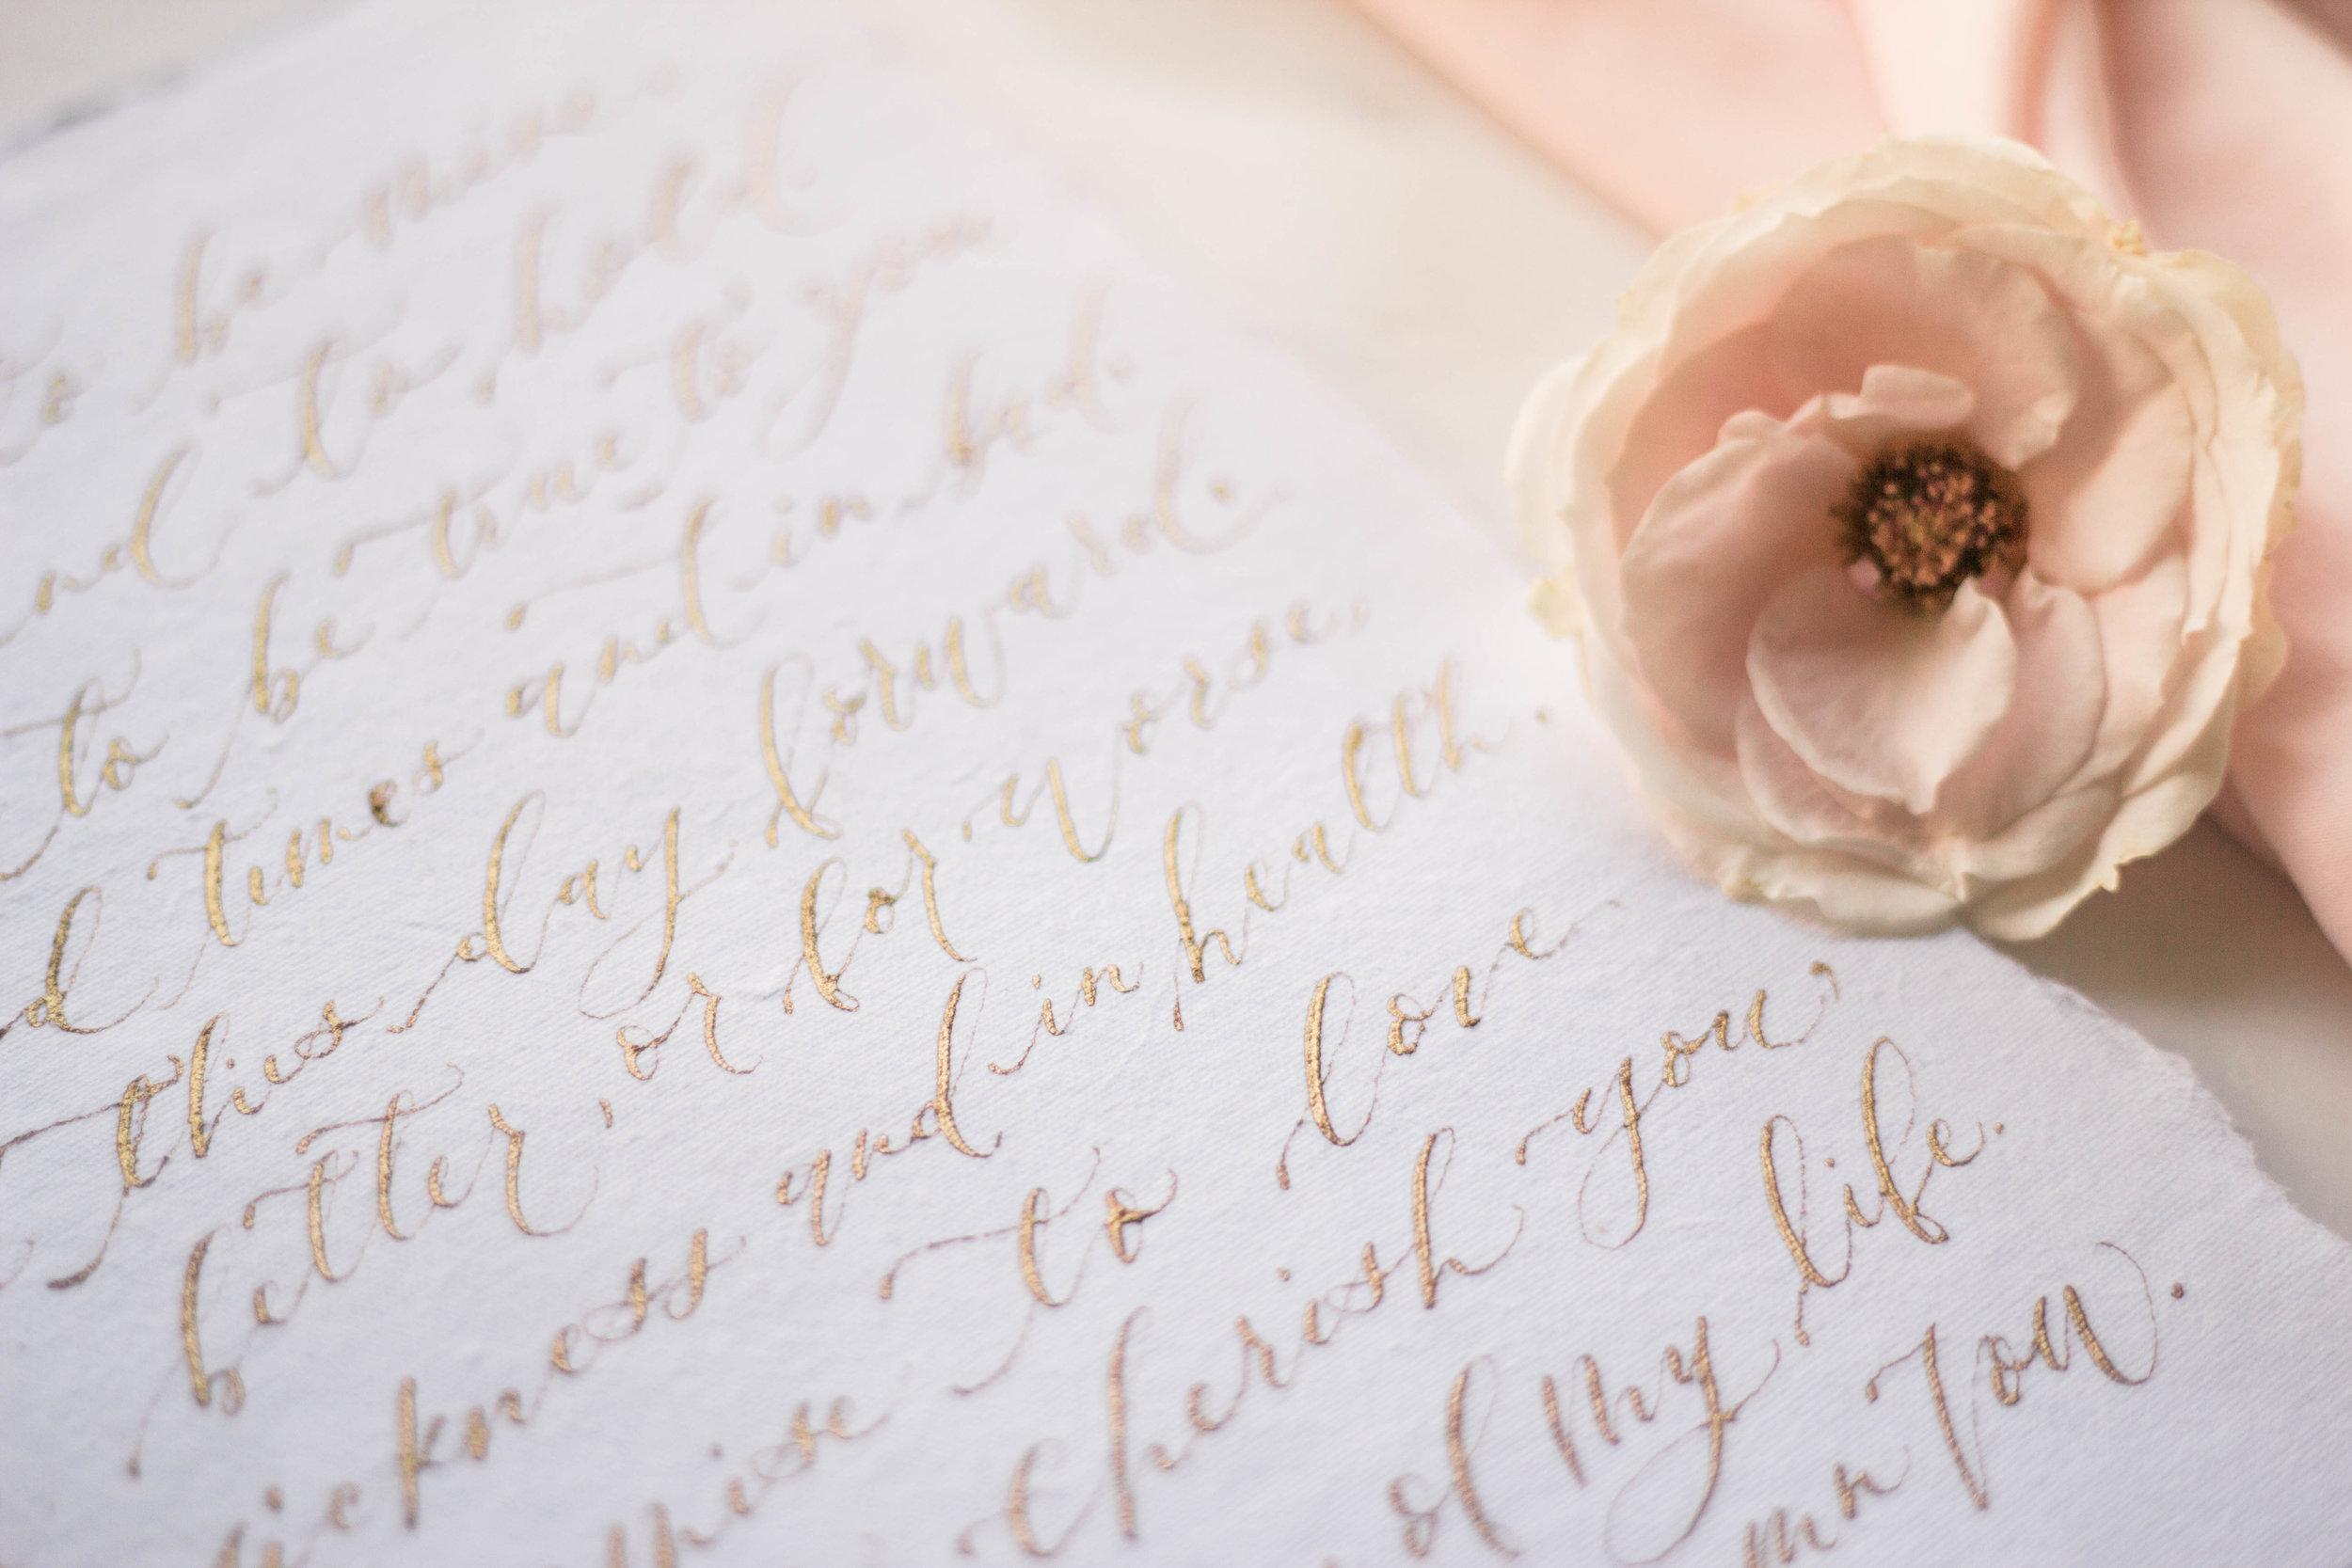 Gold Calligraphy Wedding Vows | Custom Luxury Wedding Stationery | Lauren Antoniaa Calligraphy and Design